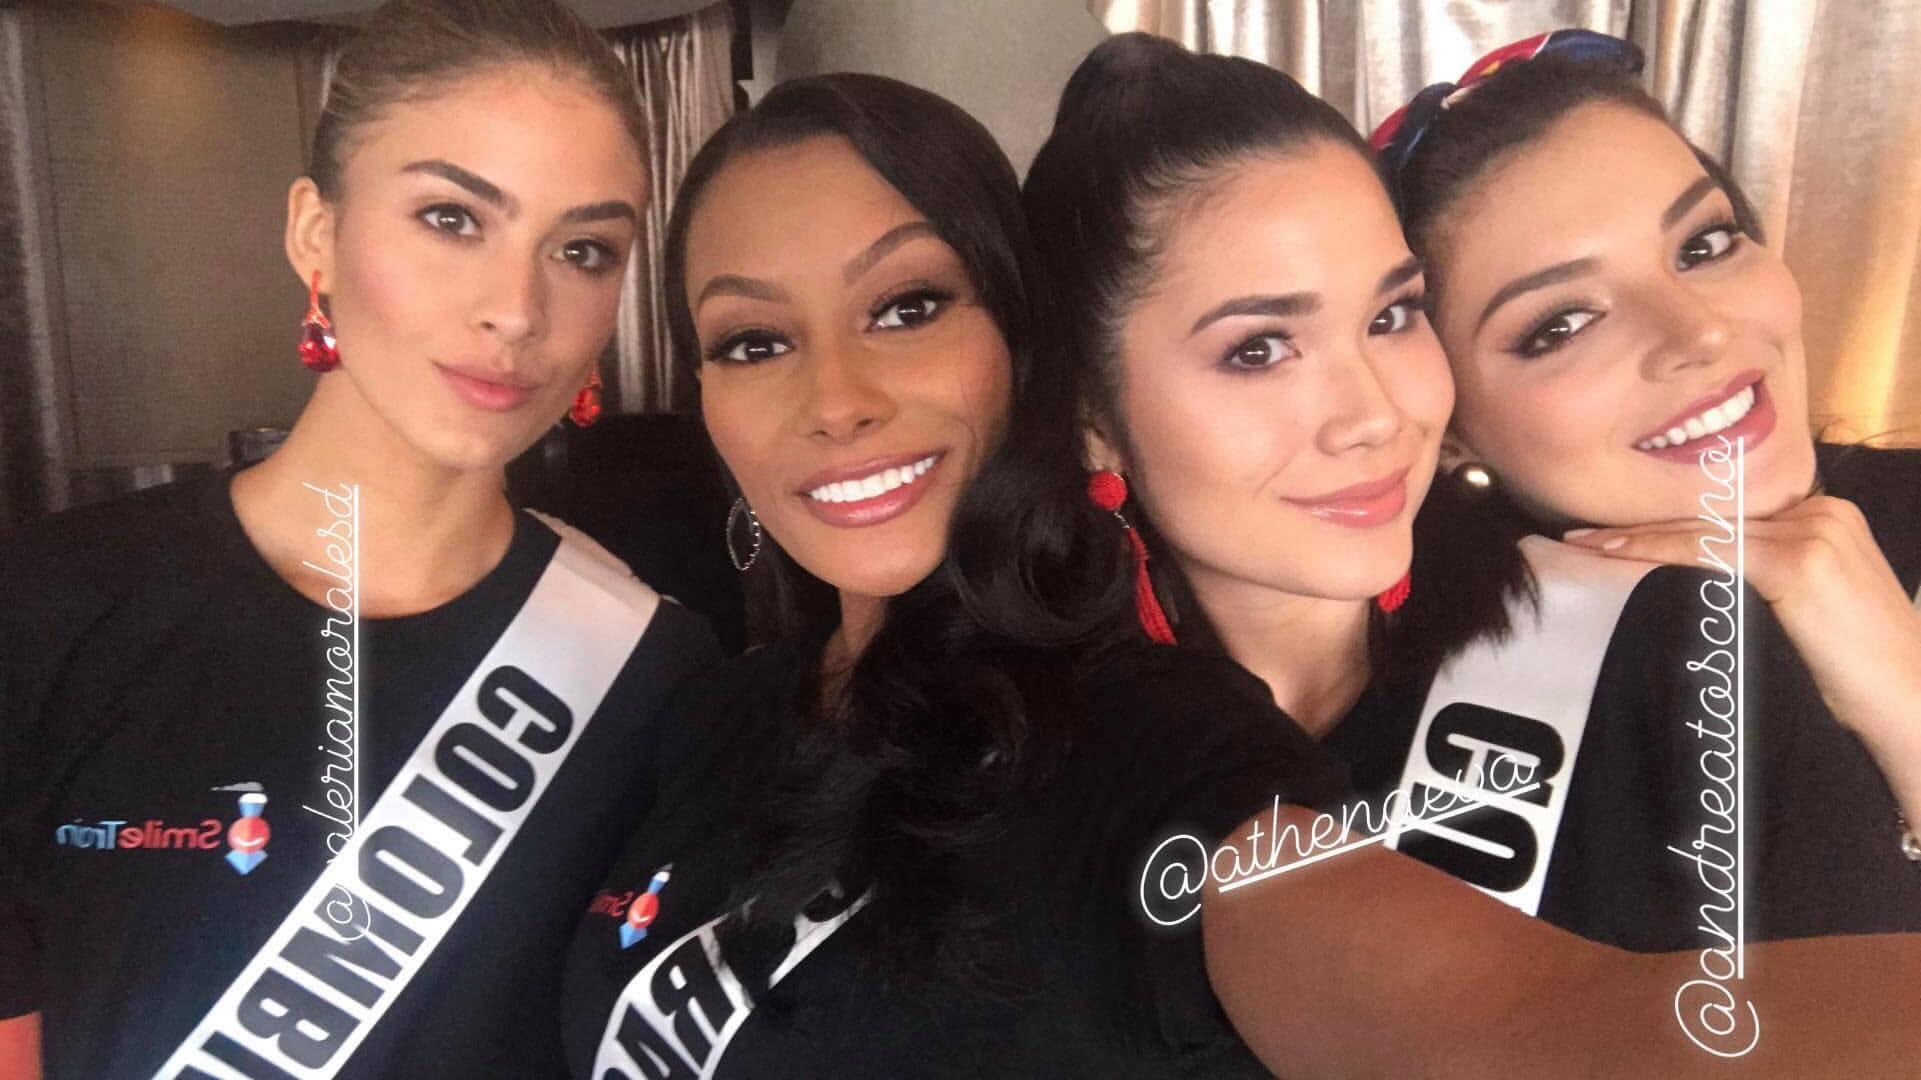 andrea toscano, miss international mexico 2019/mexicana universal 2018.  - Página 14 Aogbnc10